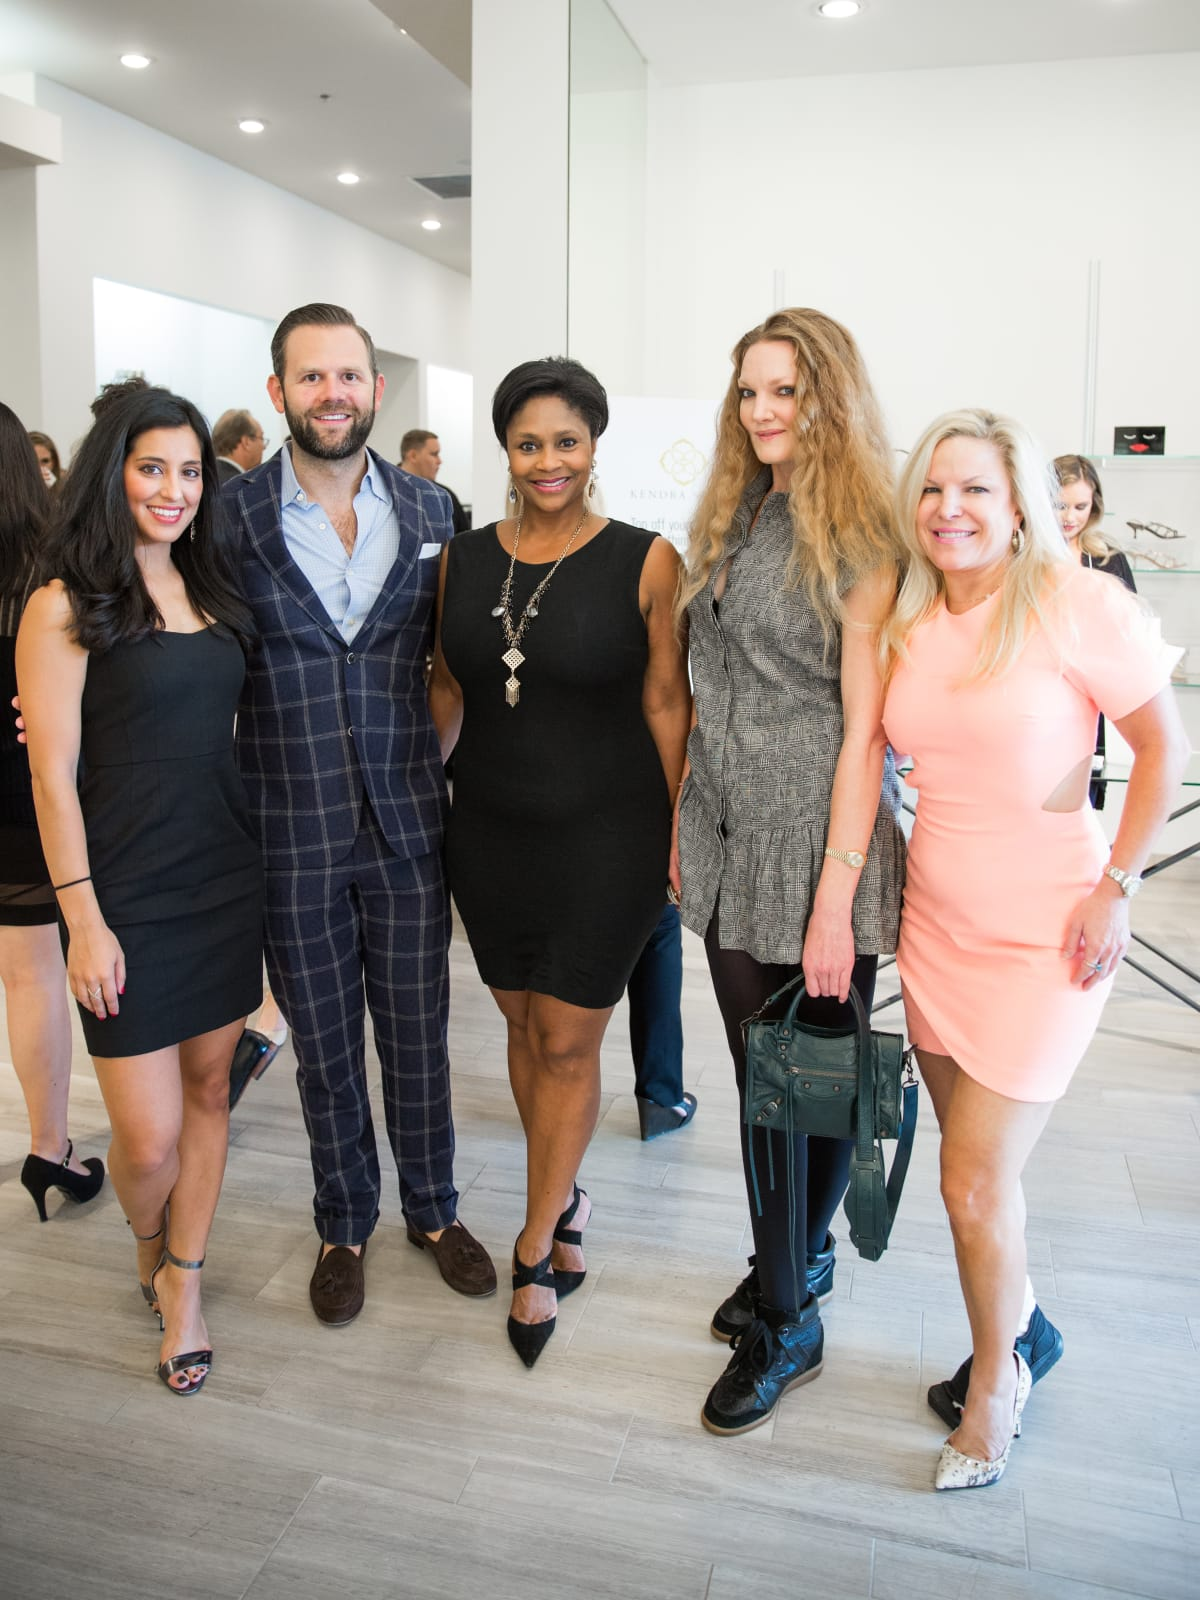 Monica Abbracciamento, Mason McCleskey, Michelle Newsome, Steffi Burns, Rebecca Marabito!